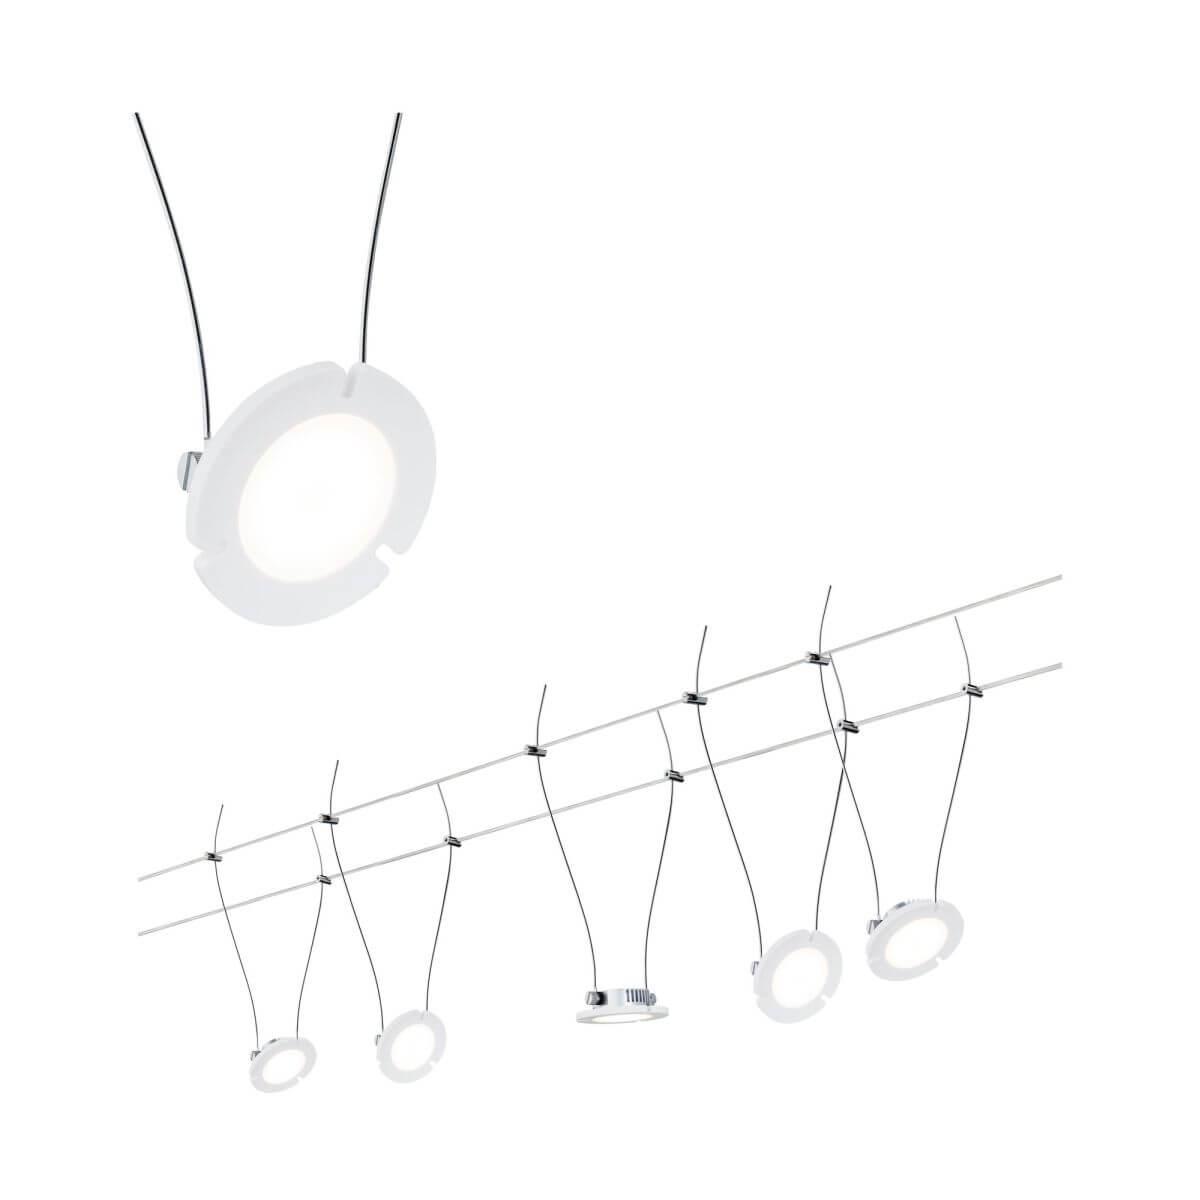 Paulmann Led Seil Set 5 X 4w Daisyled 230v 12v Dc Chrom Matt Wiring Diagram